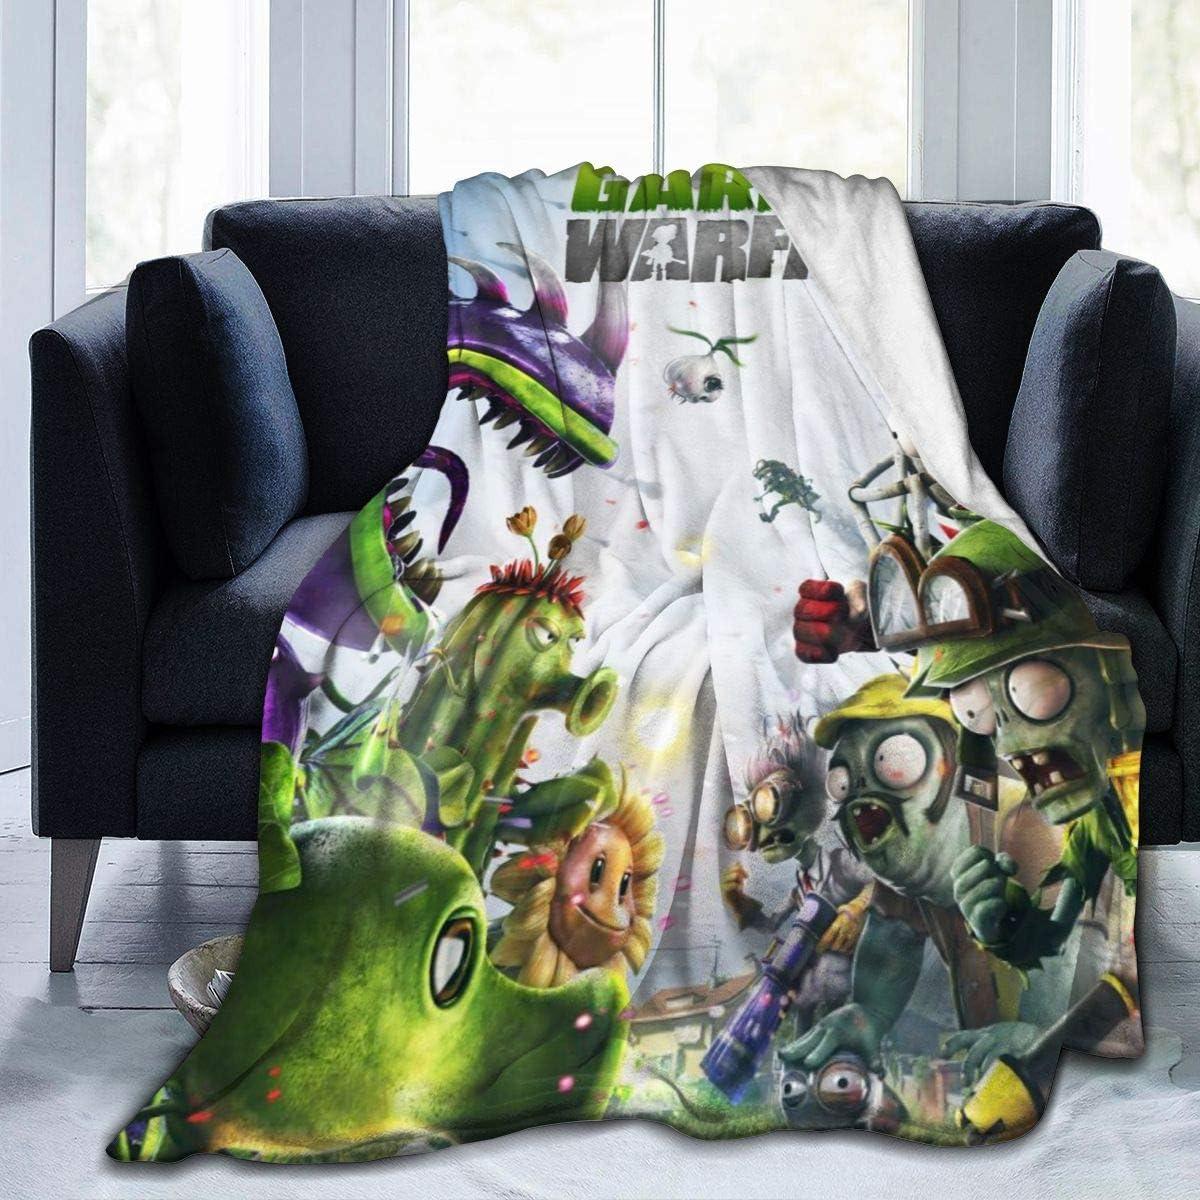 "Plants Vs Zombies Garden Warfare Home Microplush Fleece Blanket - Throw/Travel - Ultra-Soft Velvet - Luxurious Fuzzy Fleece Fur - Cozy Lightweight - Easy Care - All Season Premium Bed Blanket 50""x40"""